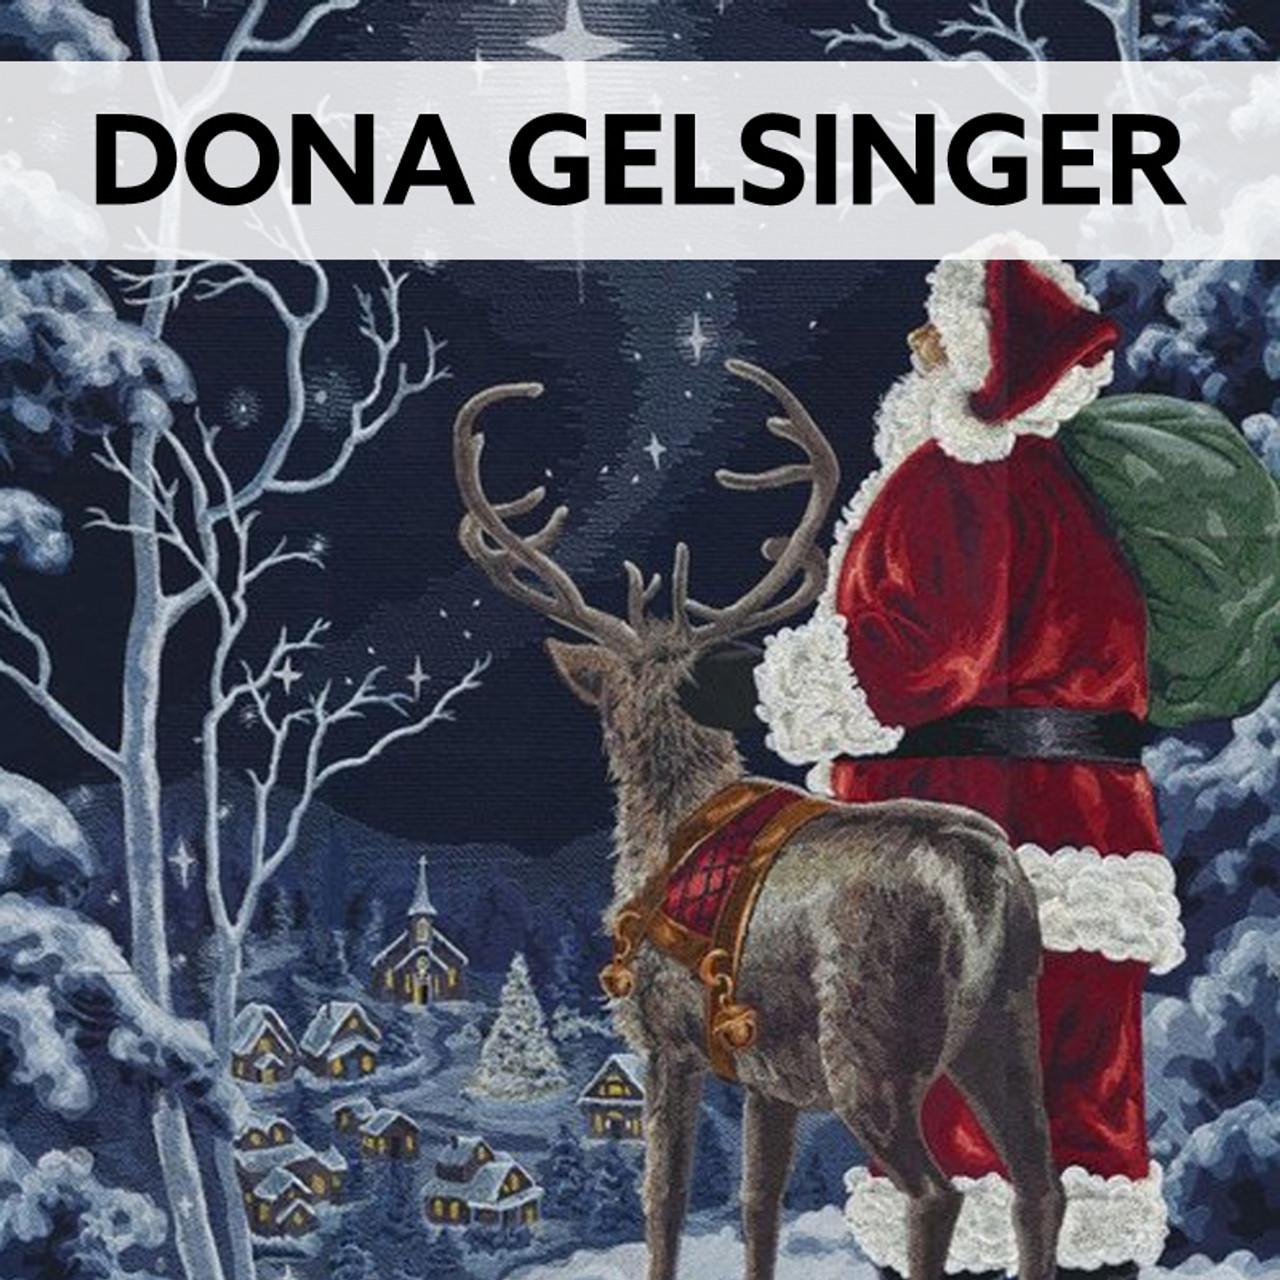 Dona Gelsinger